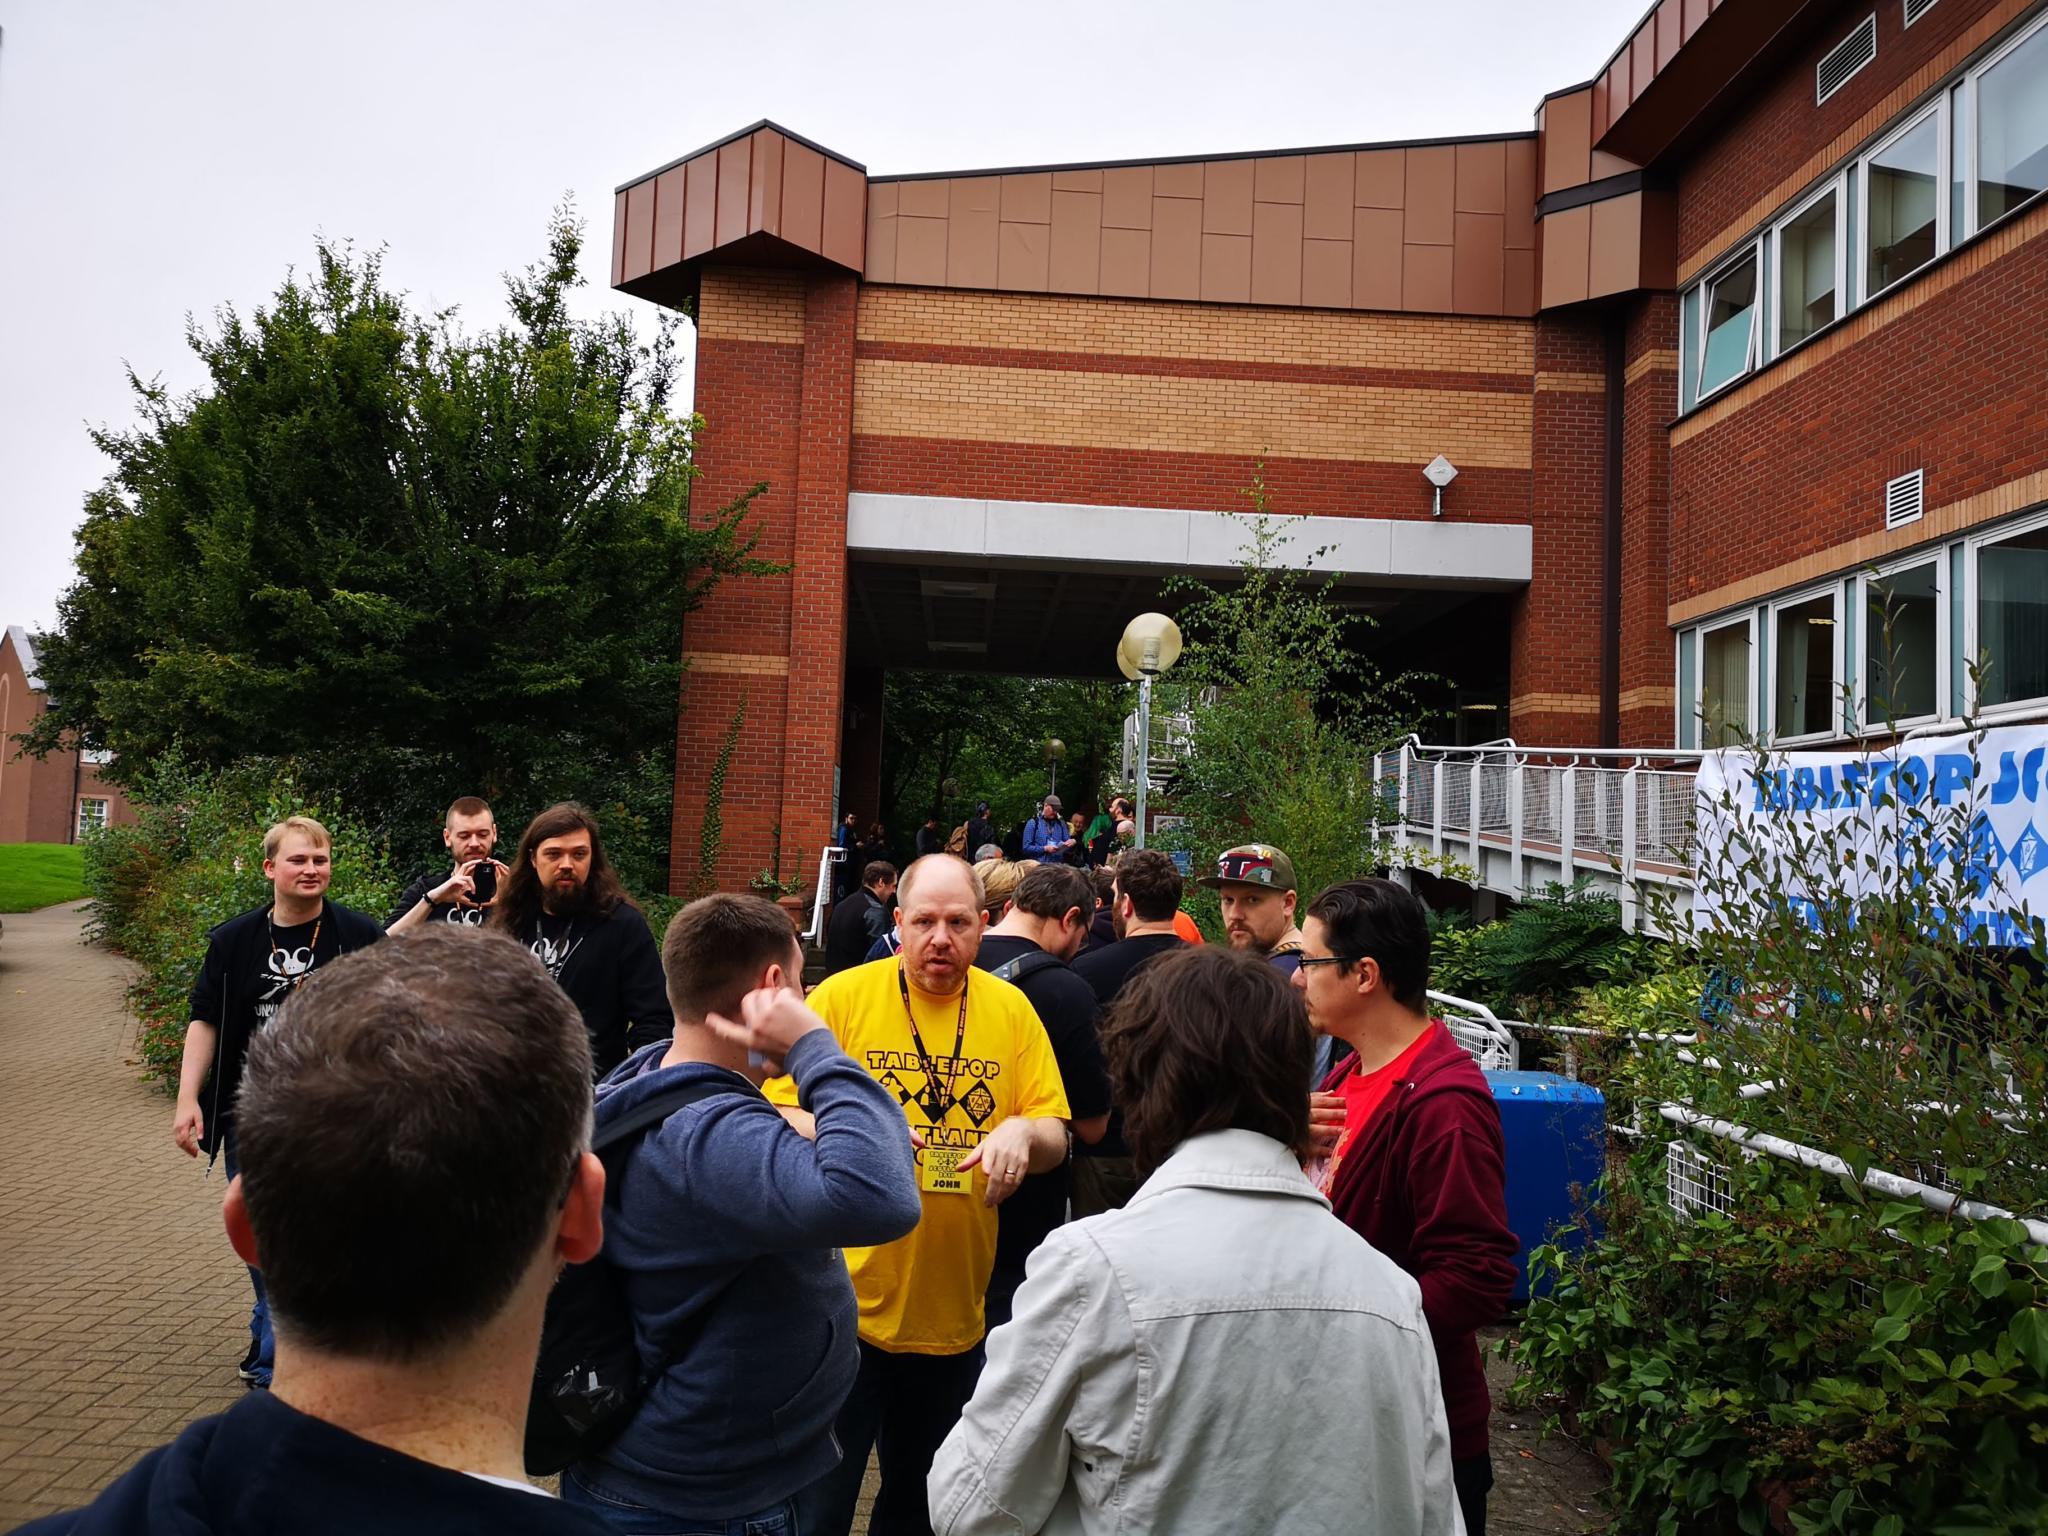 The queue outside Tabletop Scotland